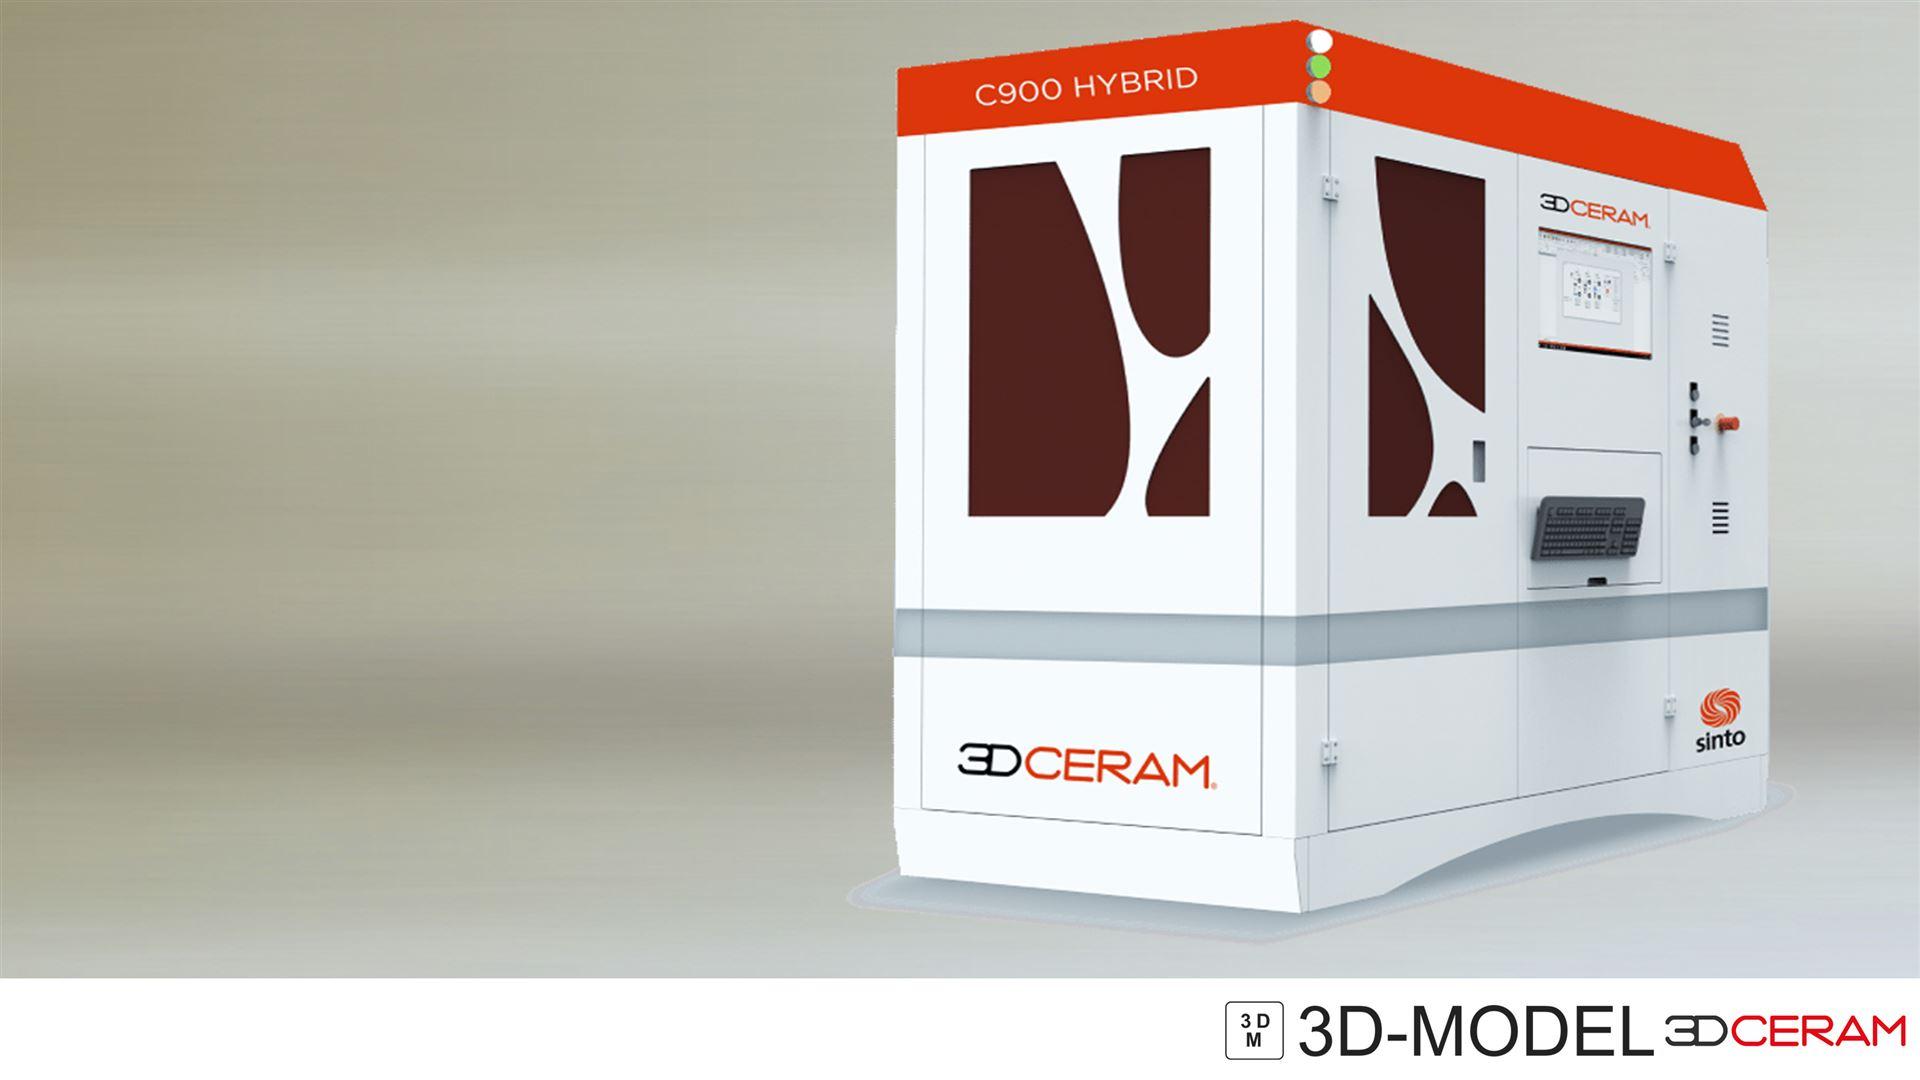 3DCERAM 3D-Drucker